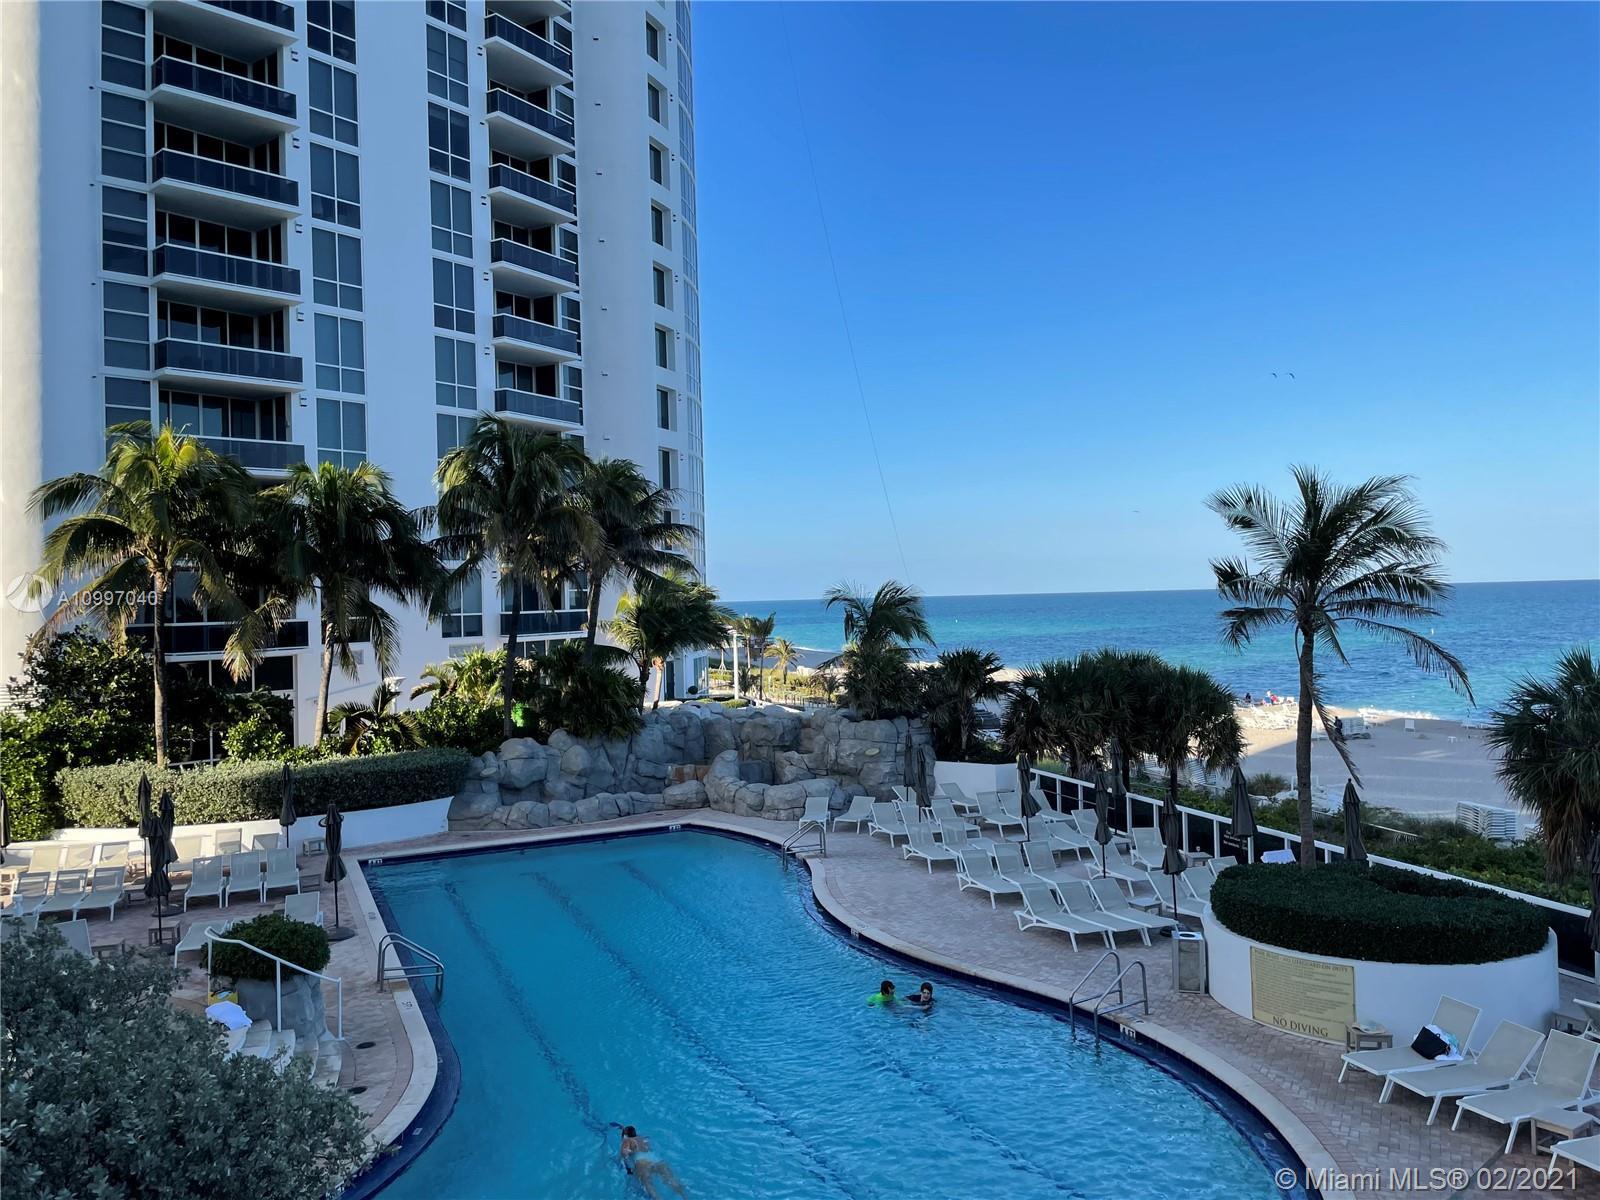 Trump International #917 - 18001 Collins Ave #917, Sunny Isles Beach, FL 33160